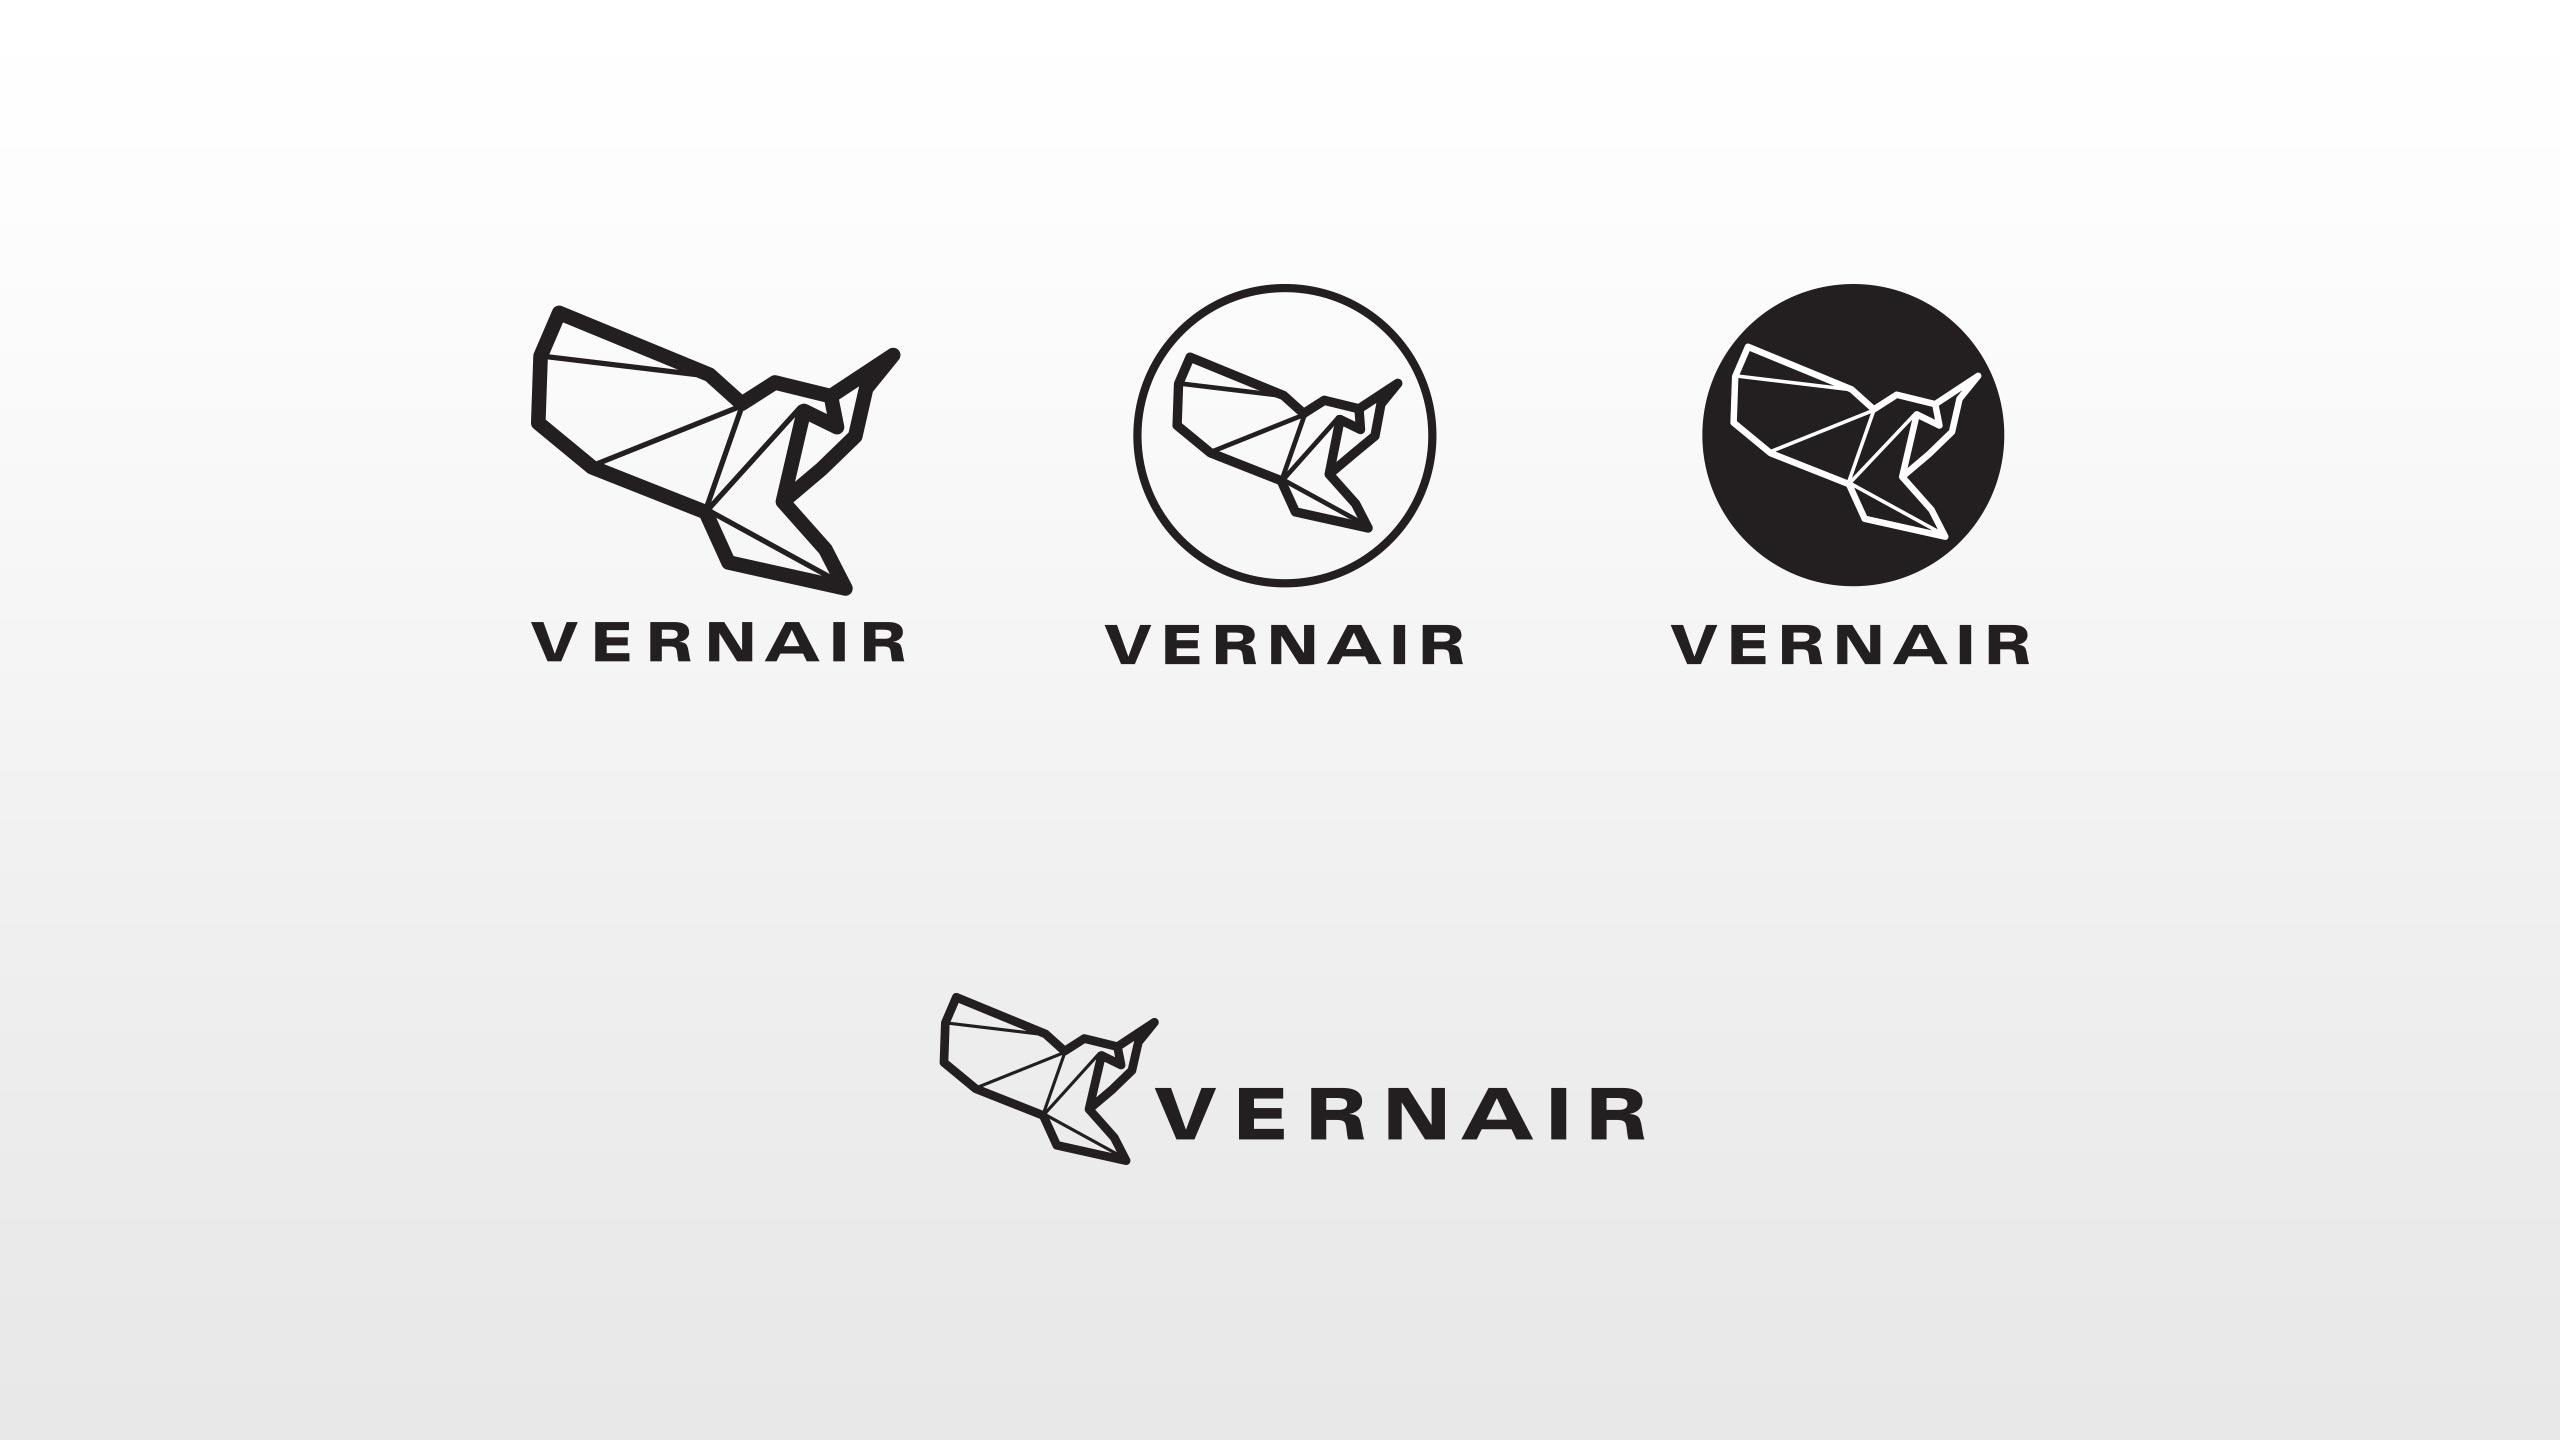 Vernair Airlines logos iterations black